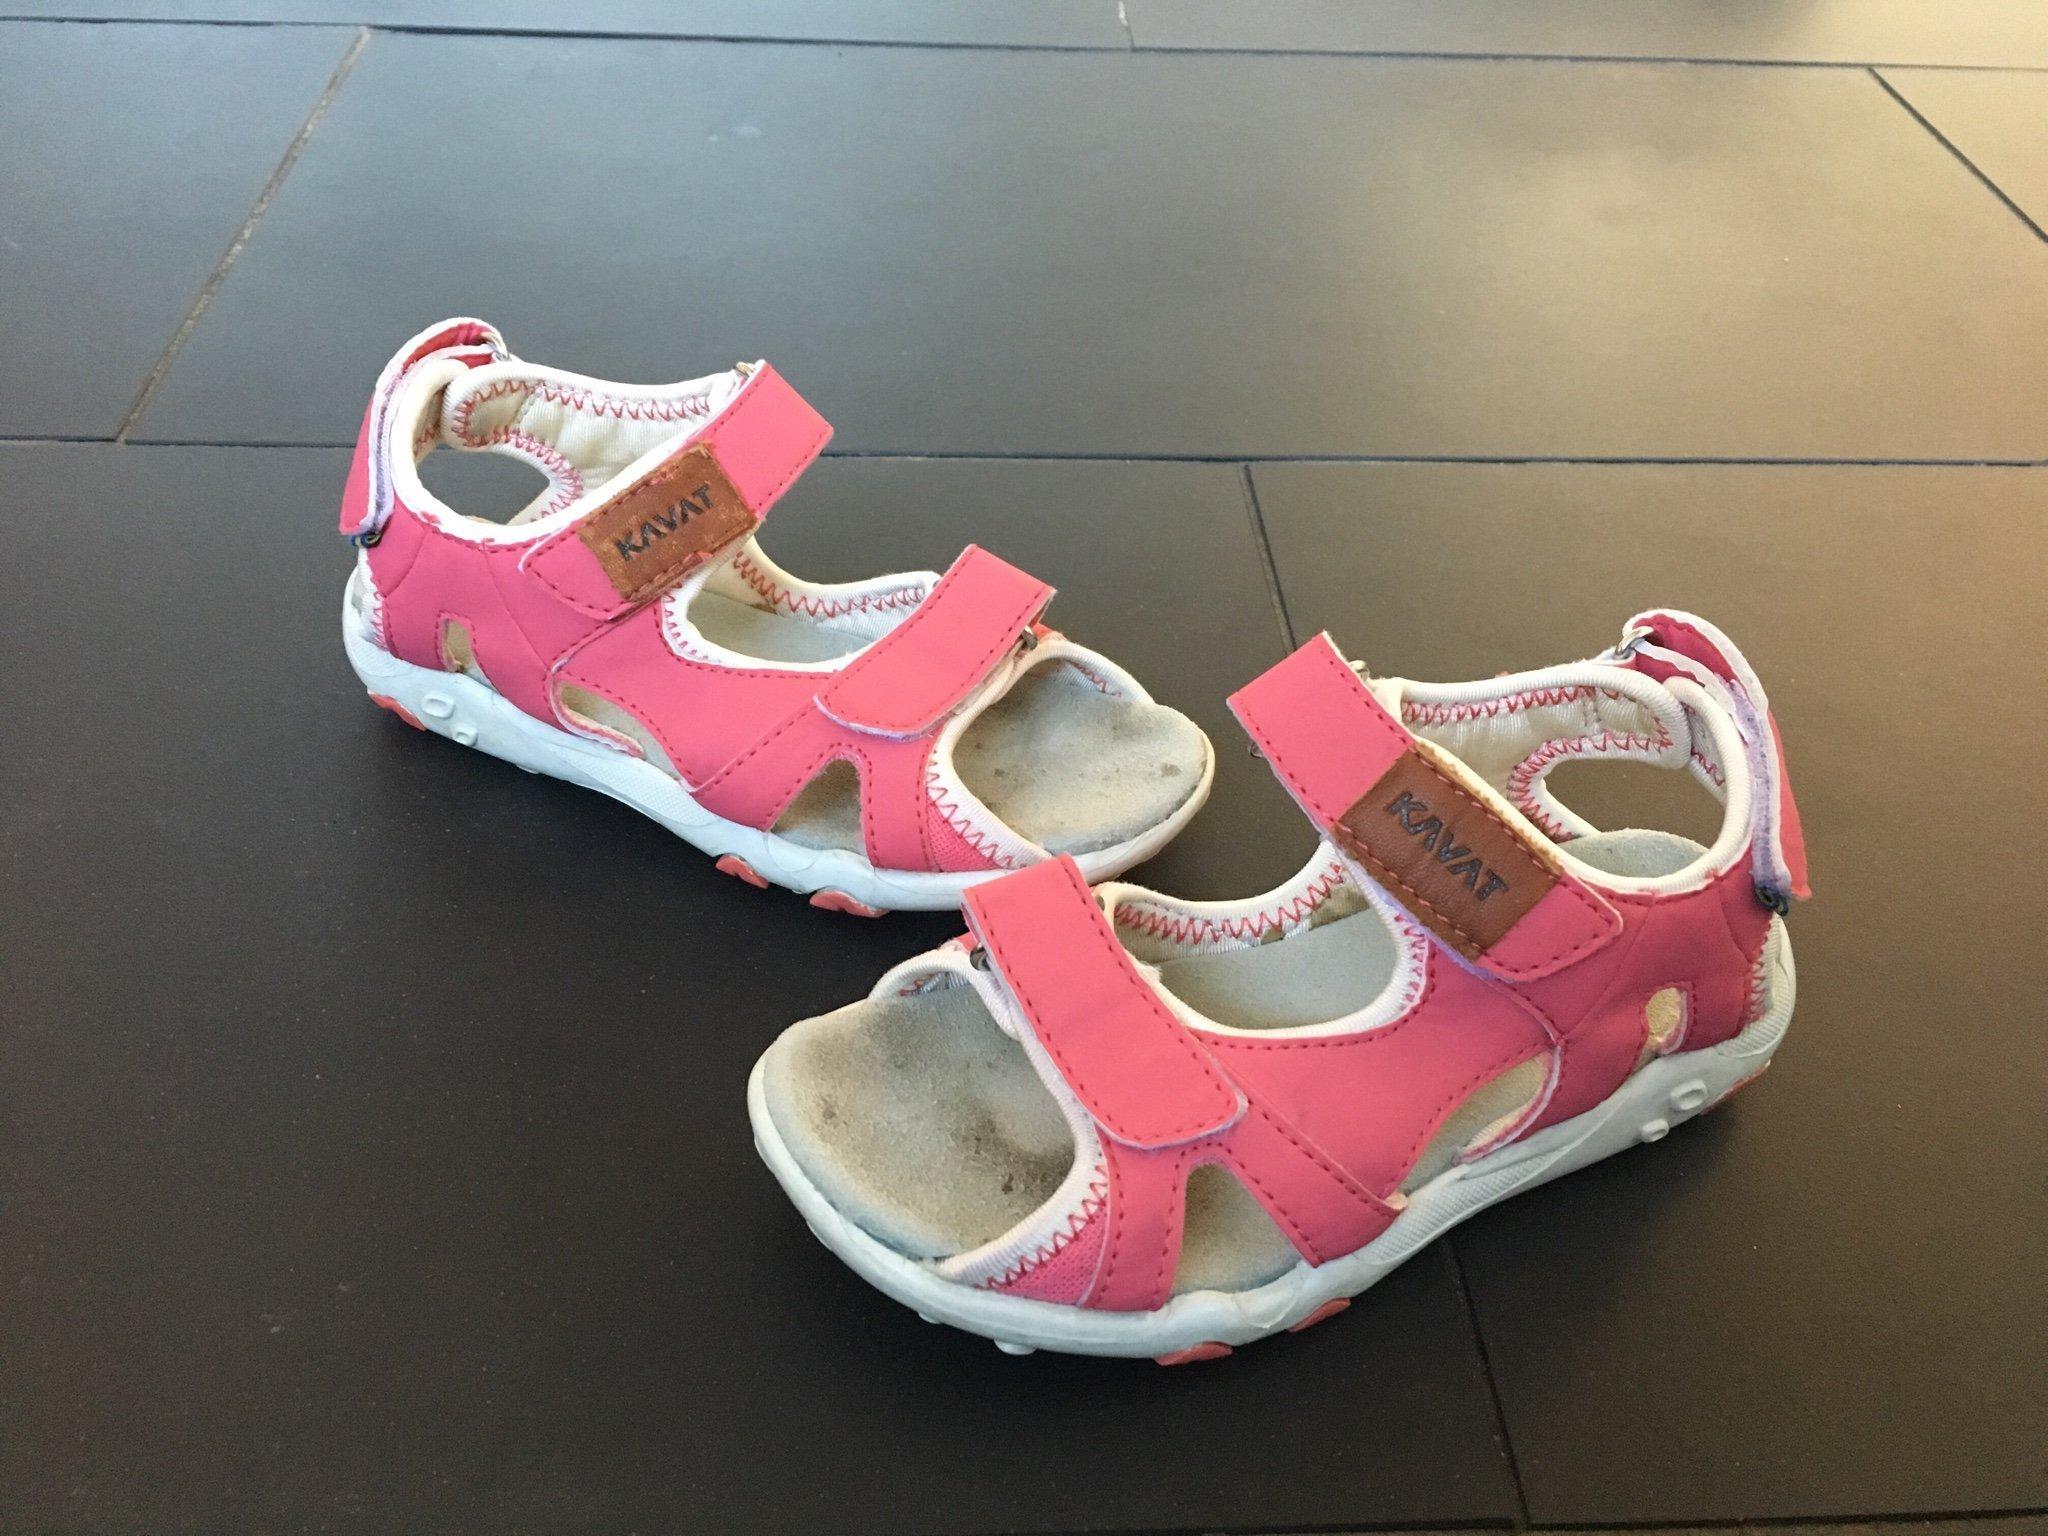 1c3f7a79c74 Kavat Rio sandaler strl 29 (348203832) ᐈ Köp på Tradera